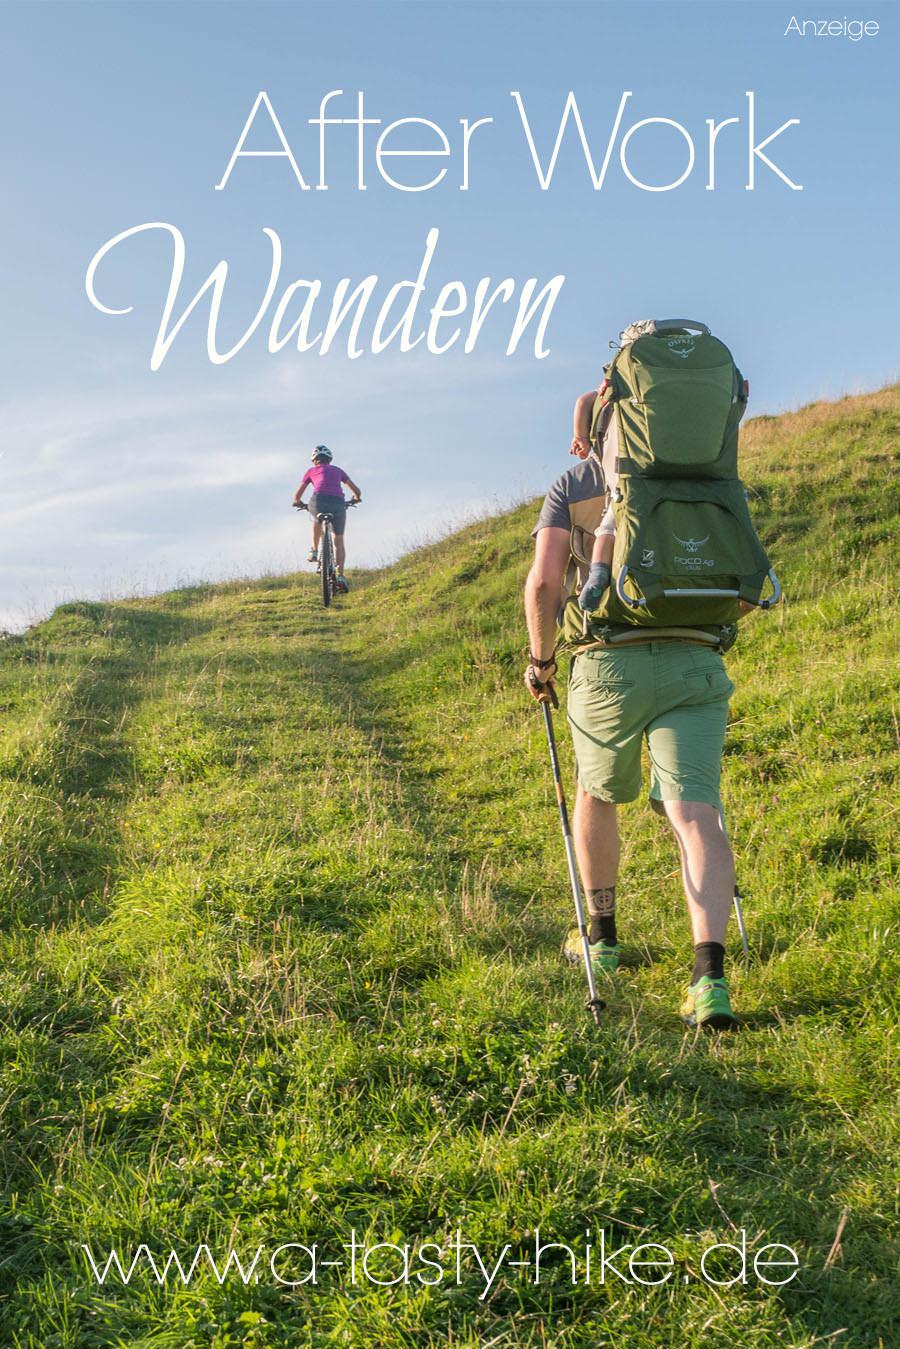 After Work Wandern am Alpsee im Allgaeu - Pinterest